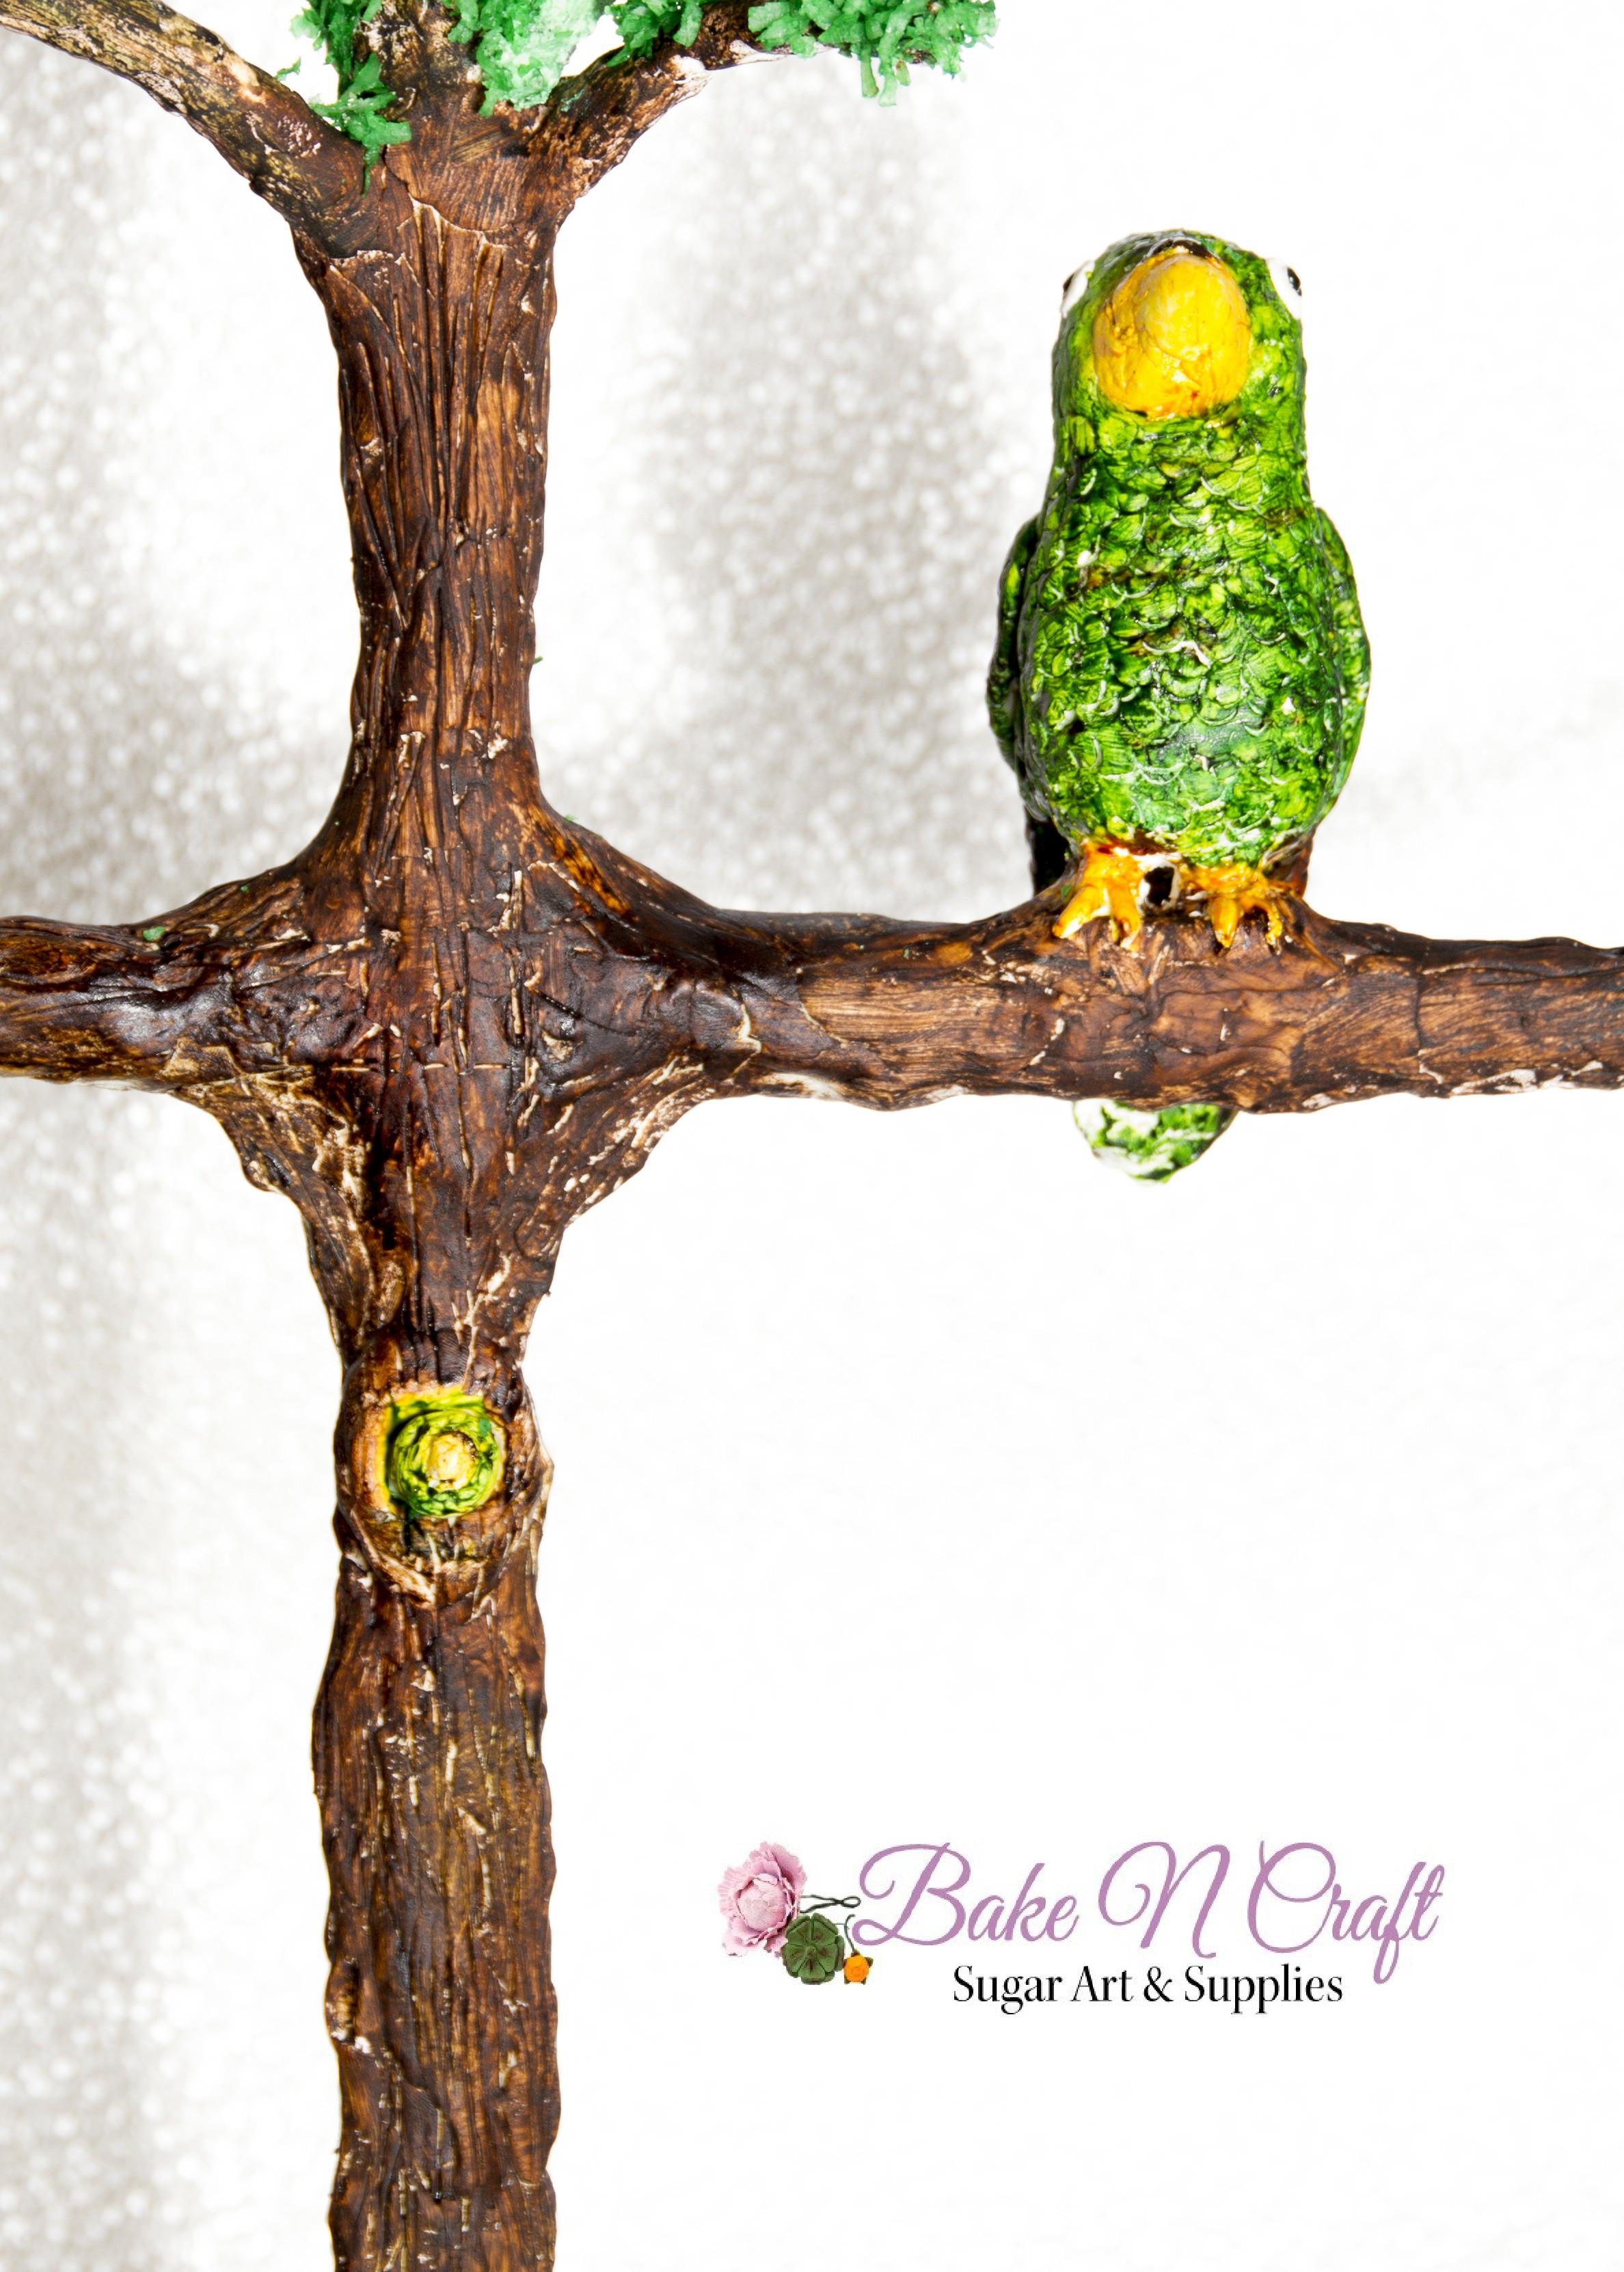 Animal-Rights-Ericka-Garcia-BakeNCraft-El-Chocoyo.png#asset:13720